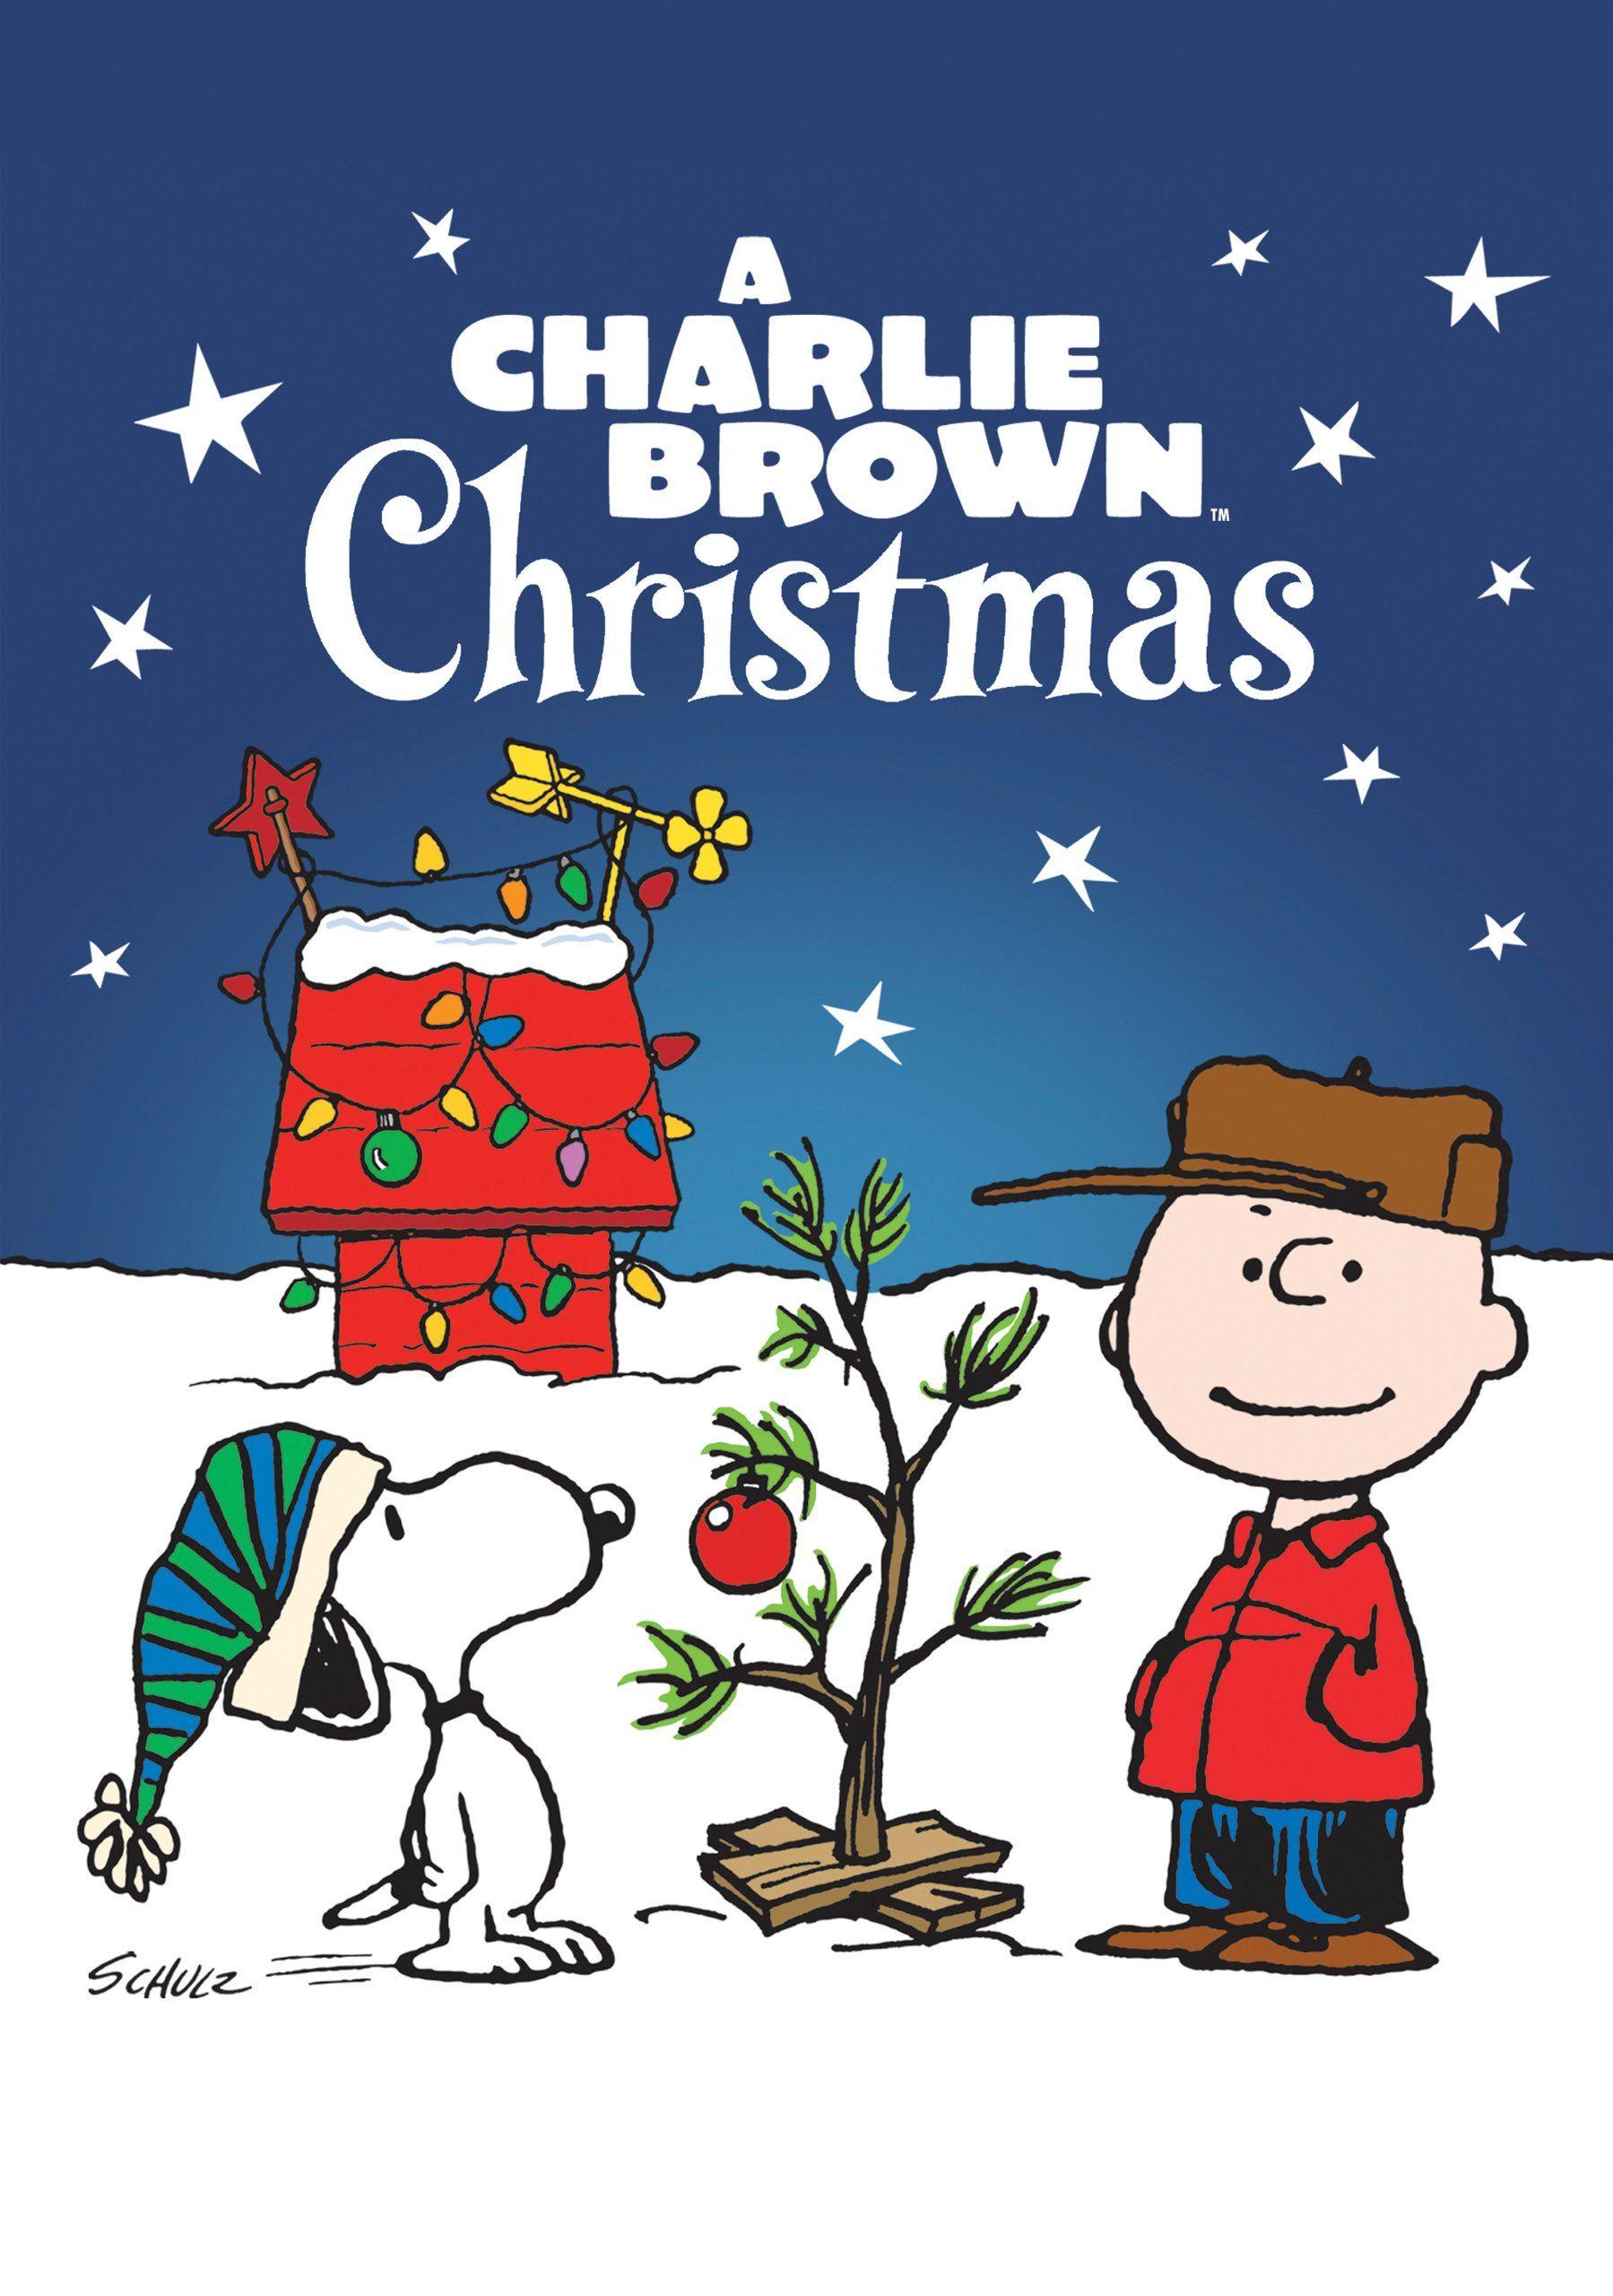 A Charlie Brown Christmas Charlie brown